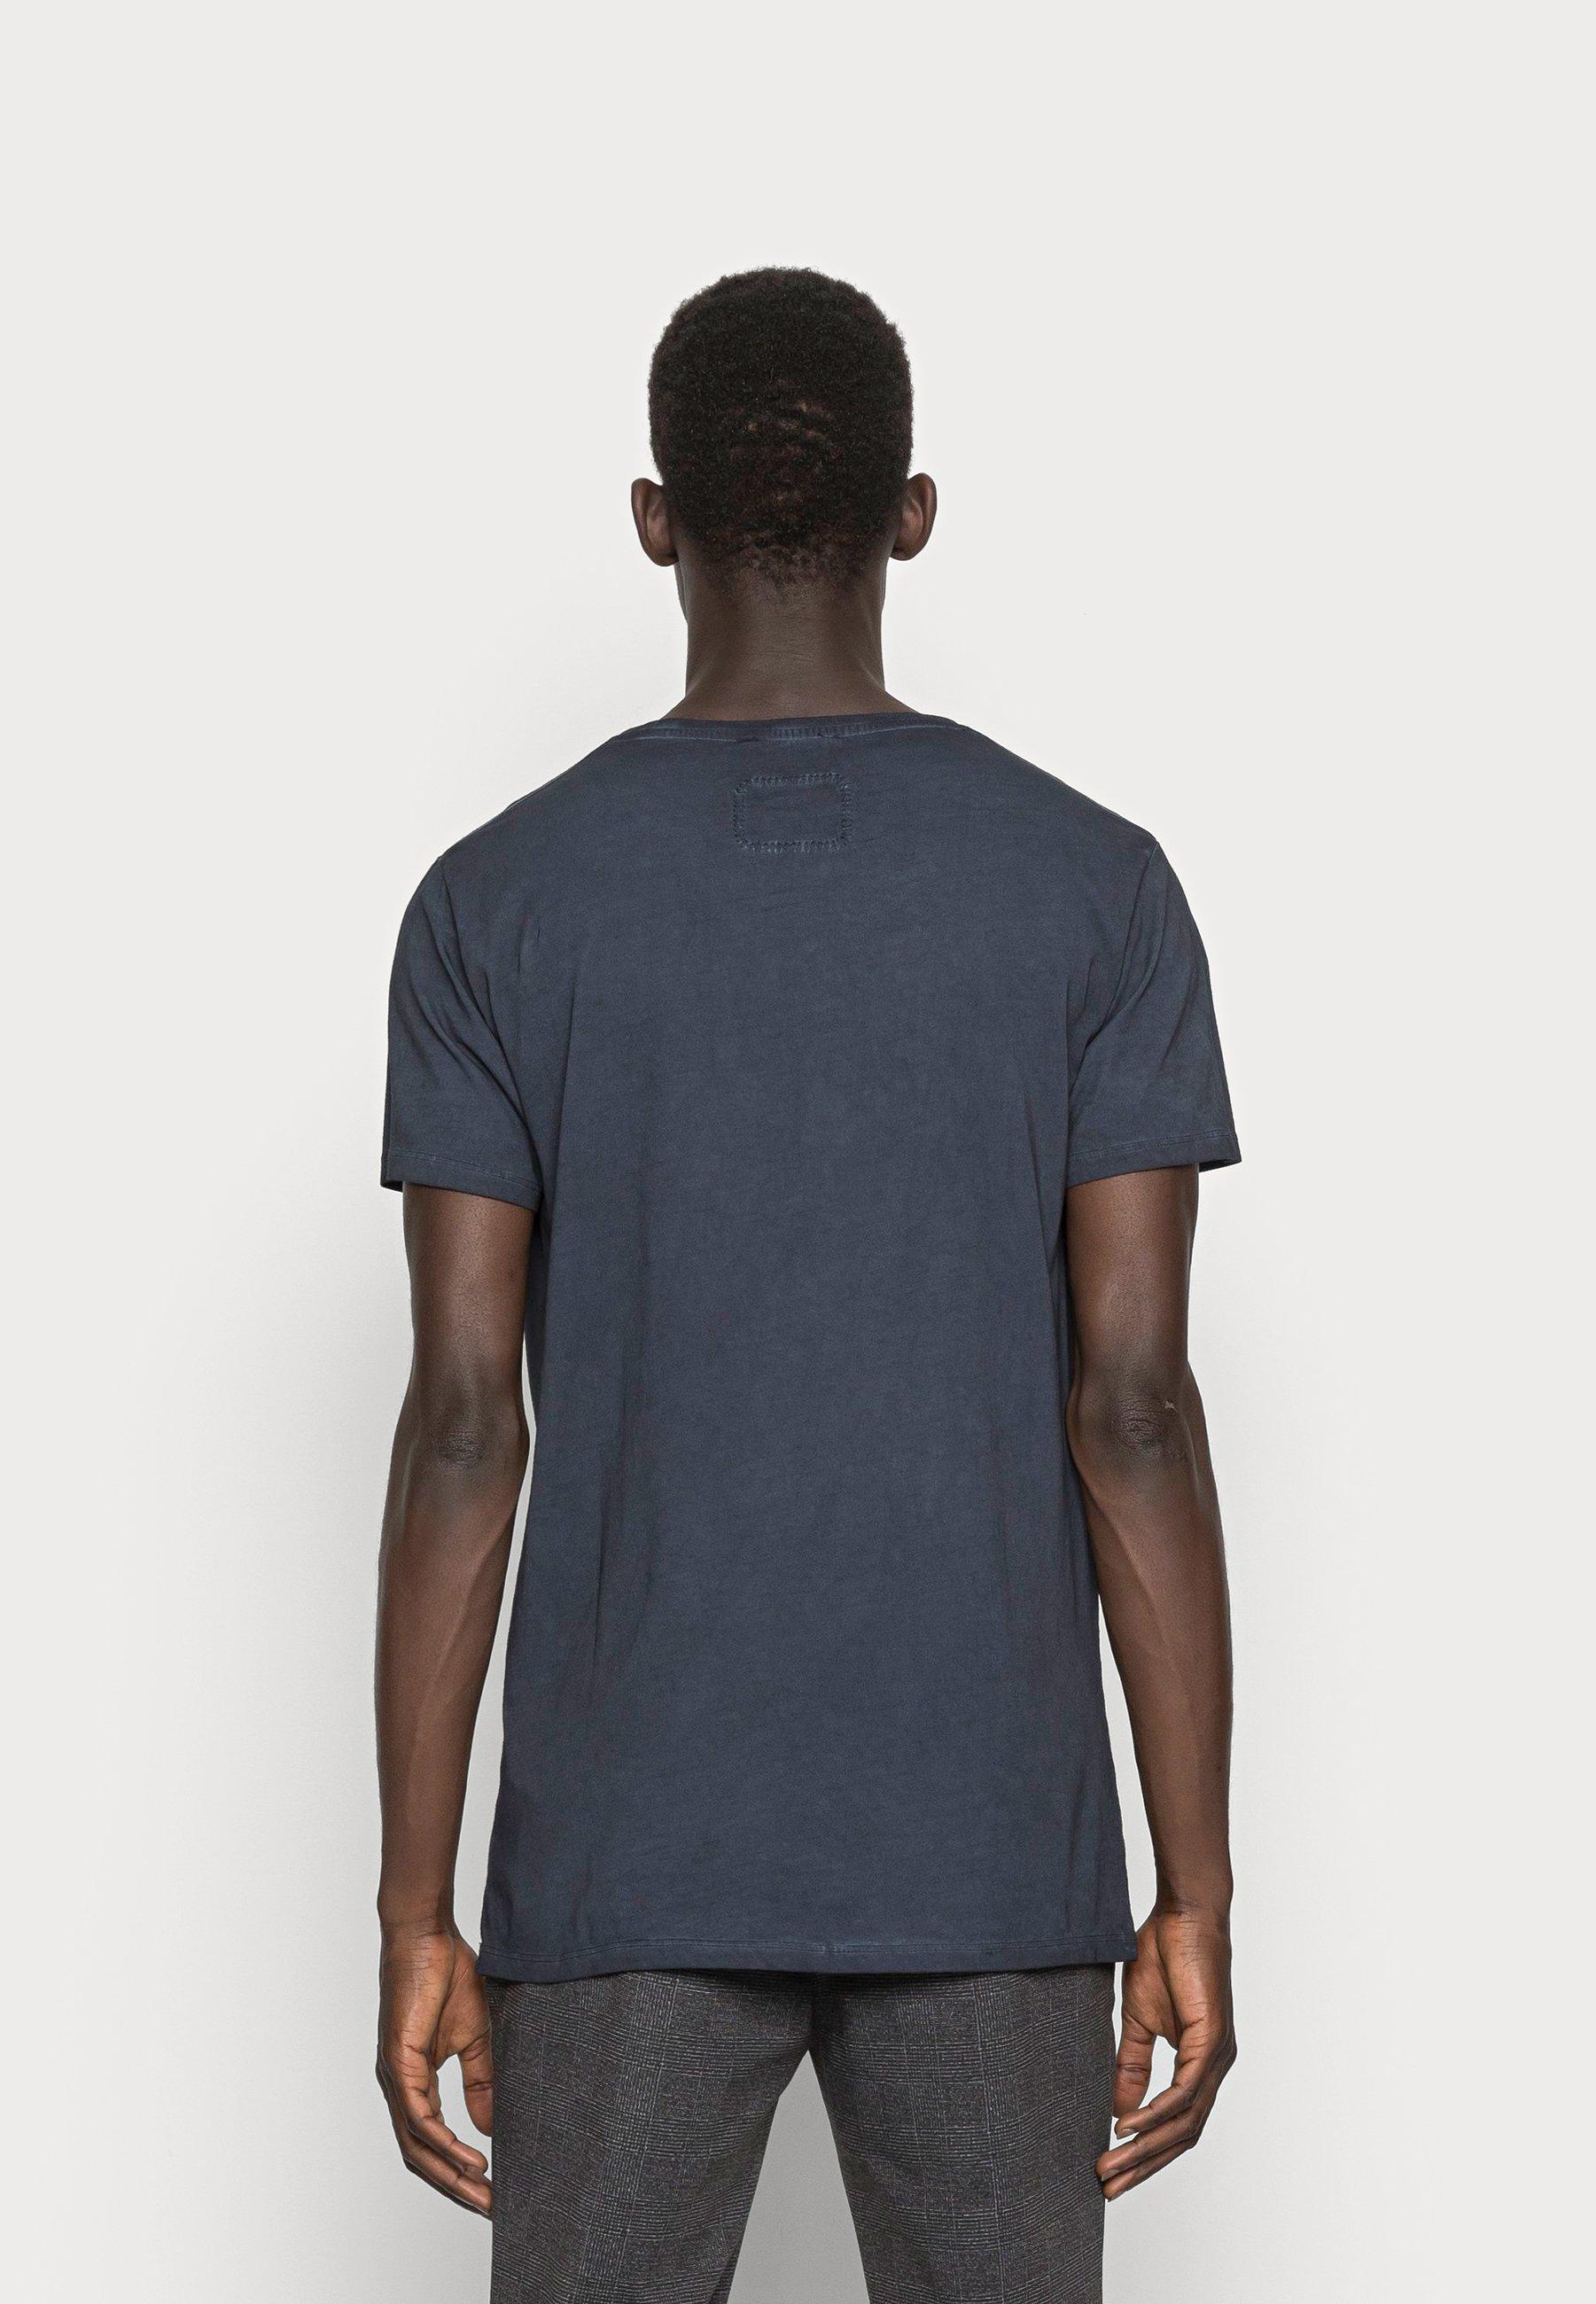 Uomo HEIN VINTAGE - T-shirt basic